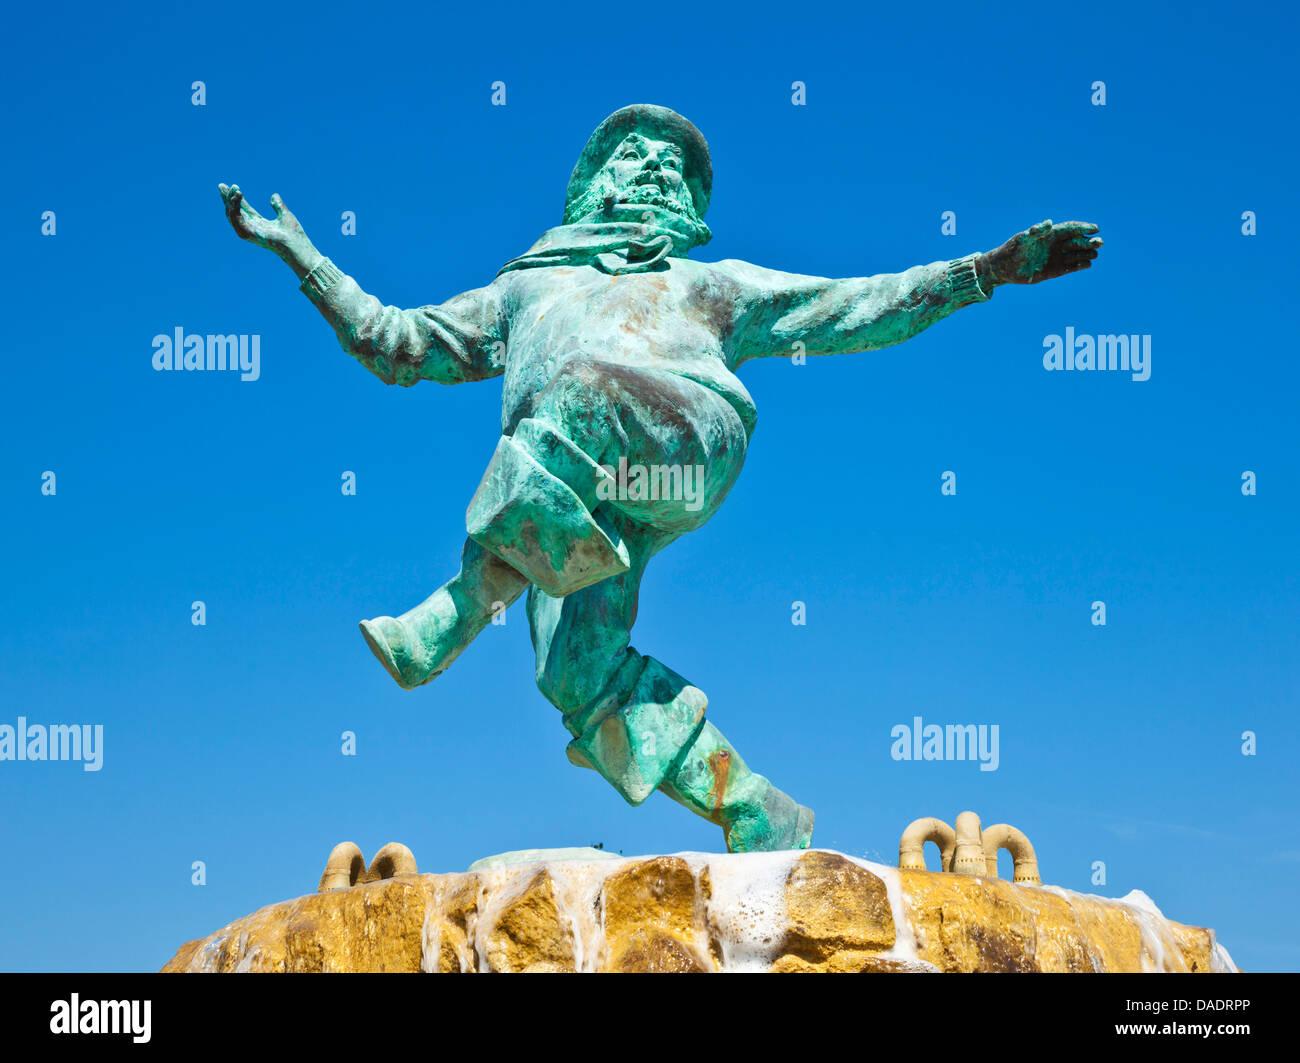 Jolly fisherman statue Skegness Tower Gardens Lincolnshire england UK GB EU Europe - Stock Image